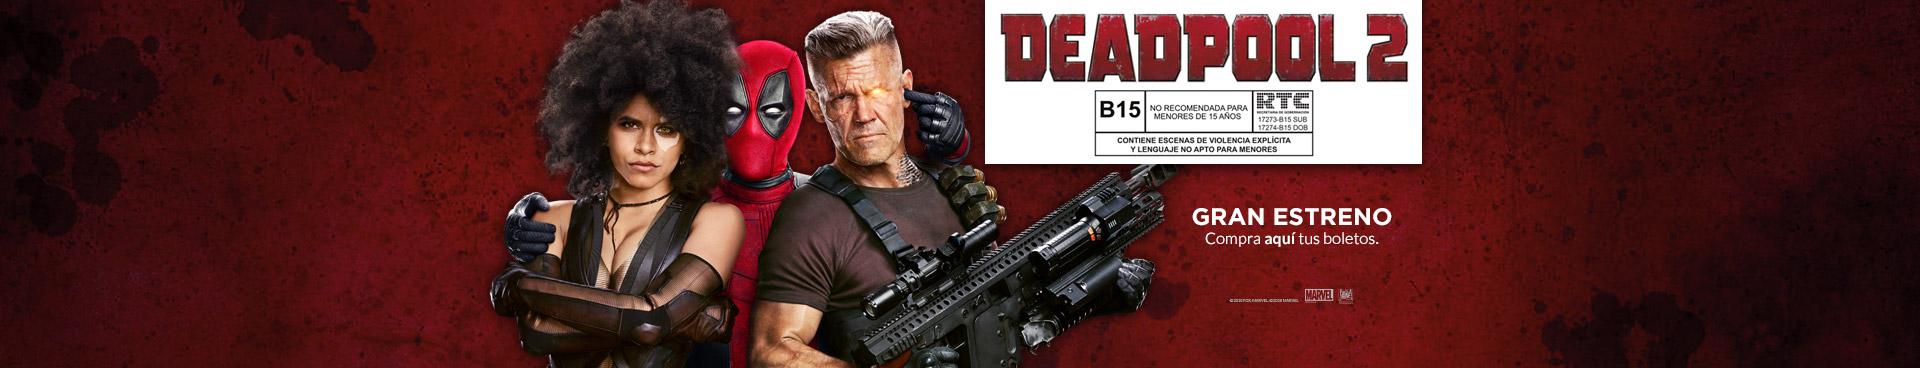 Gran estreno: Deadpool 2